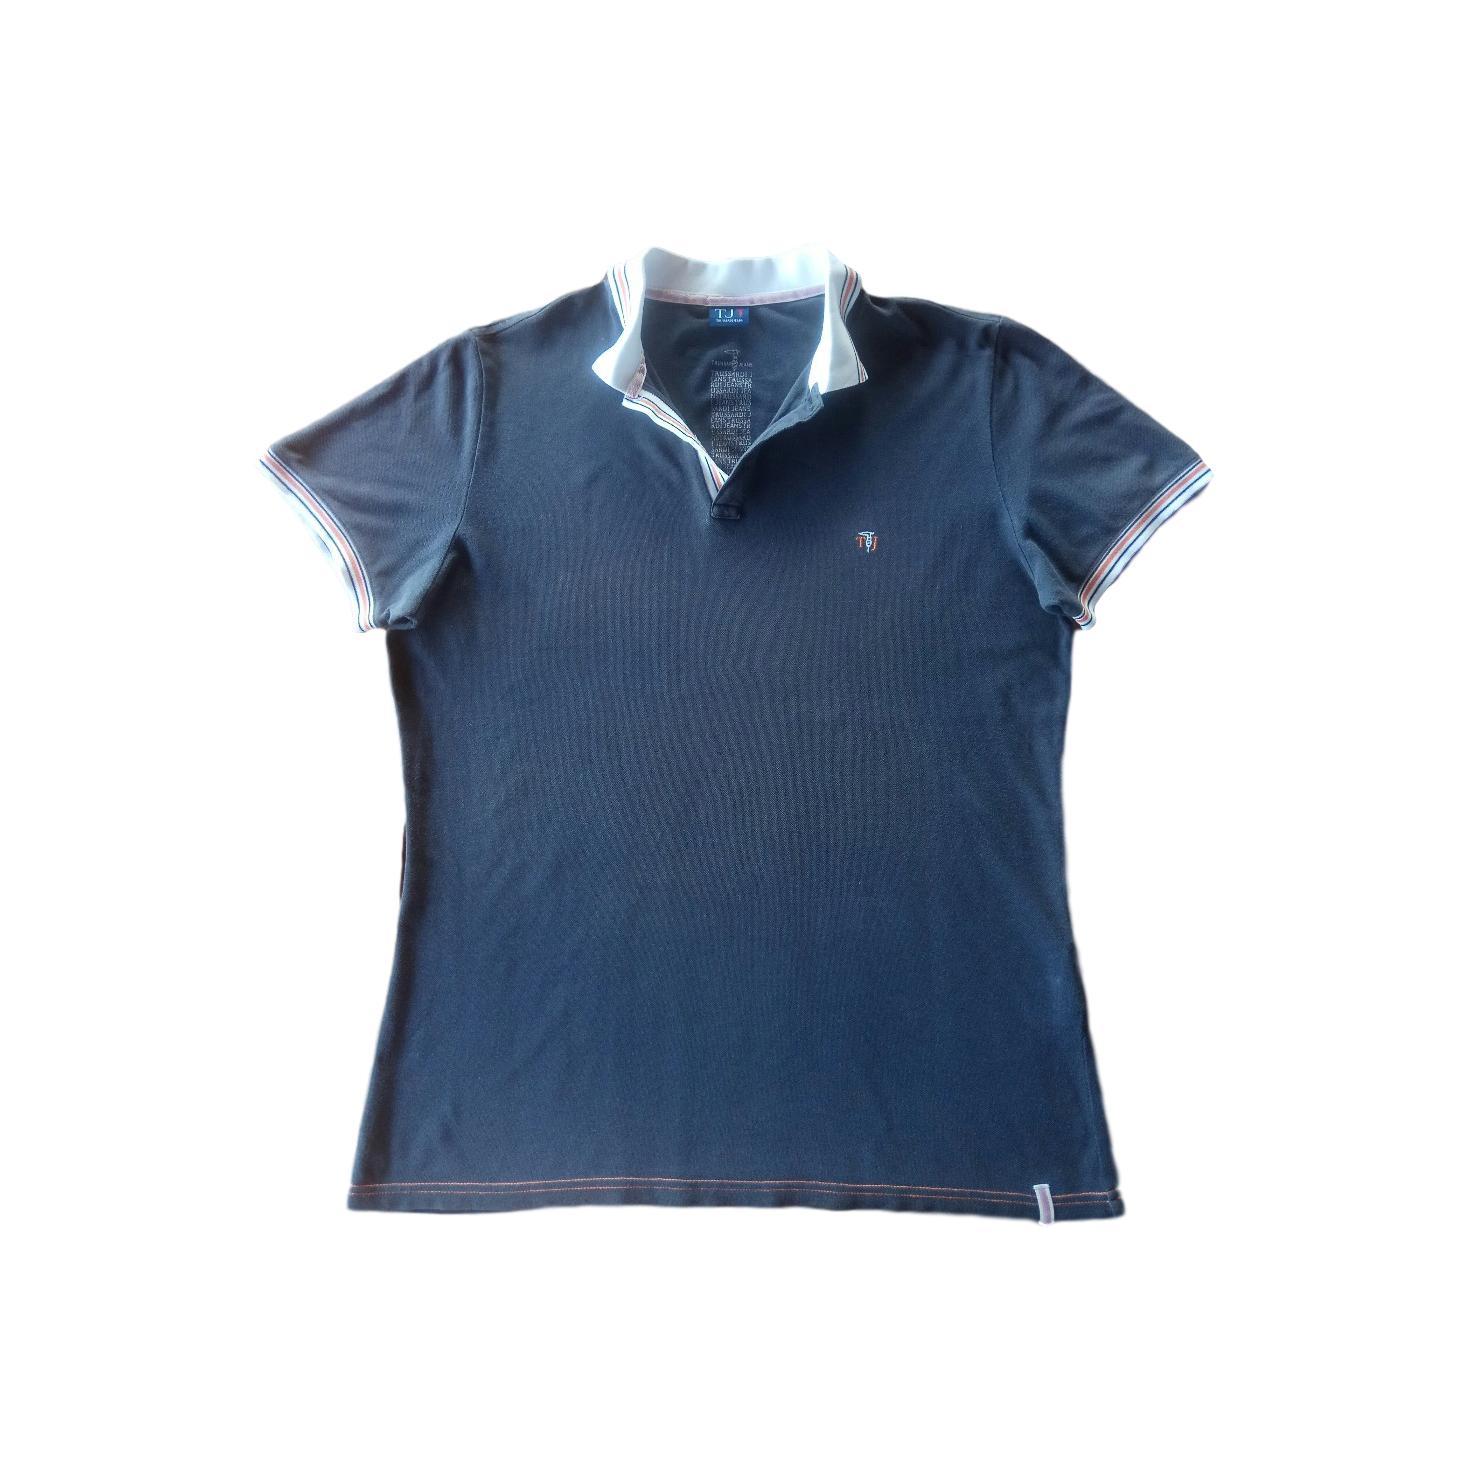 Купить футболку, поло Trussardi Jeans за 3000 руб. в интернет ... a6244bdc6f5